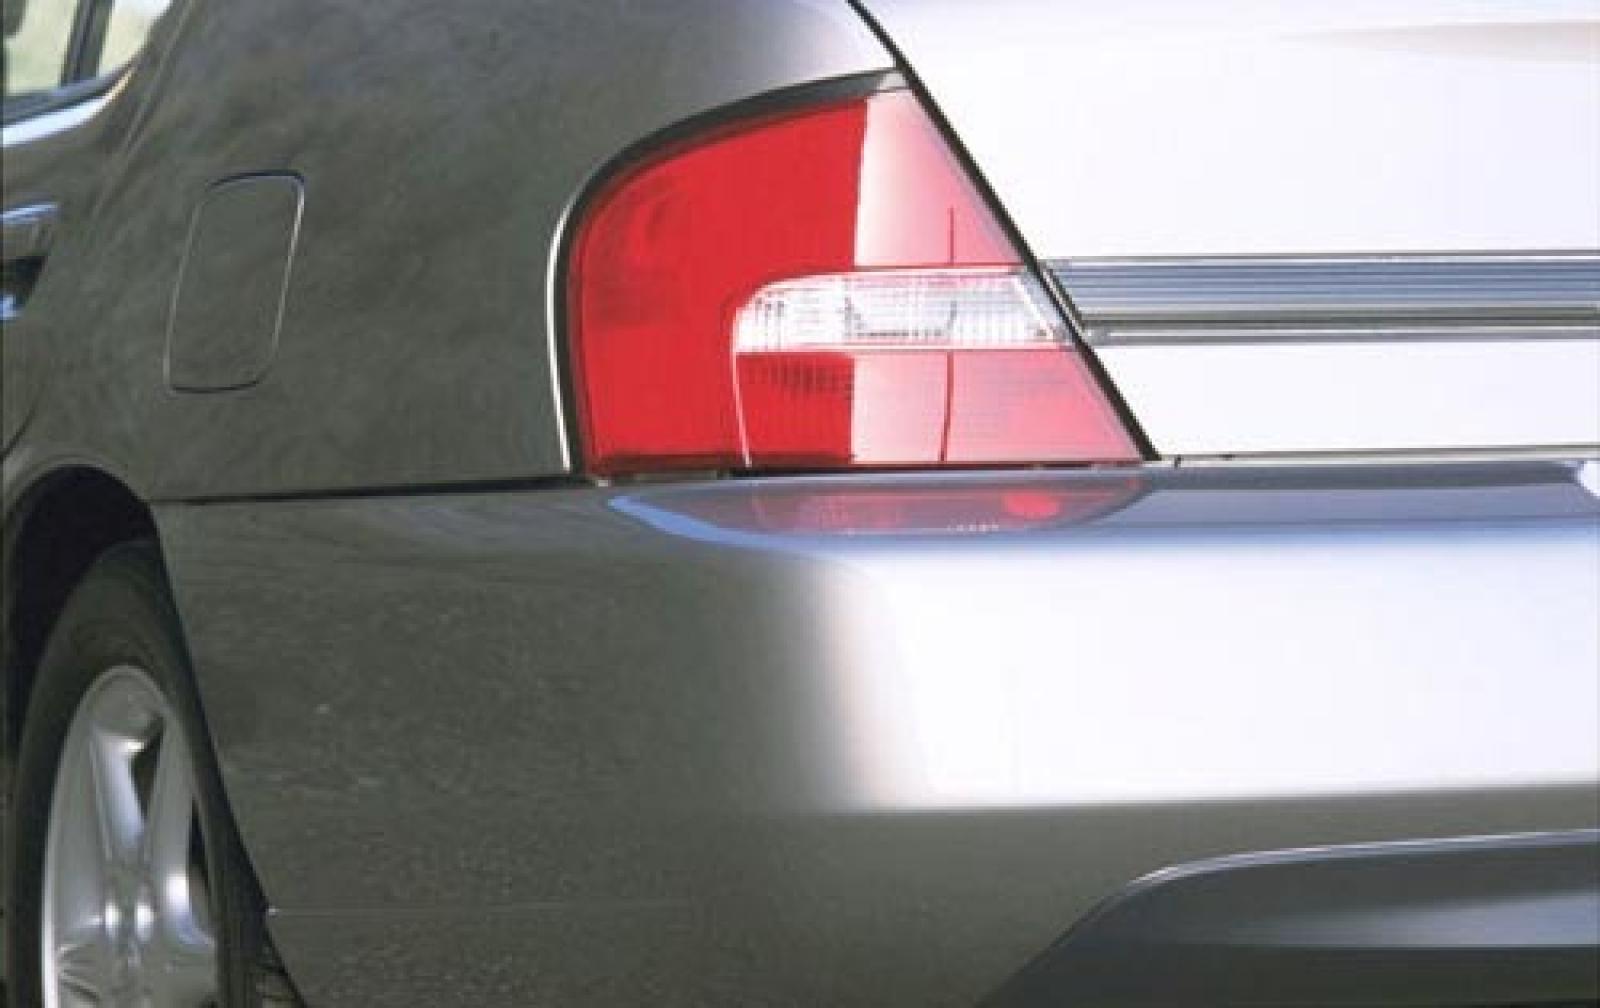 800 1024 1280 1600 Origin 2001 Nissan Altima ...